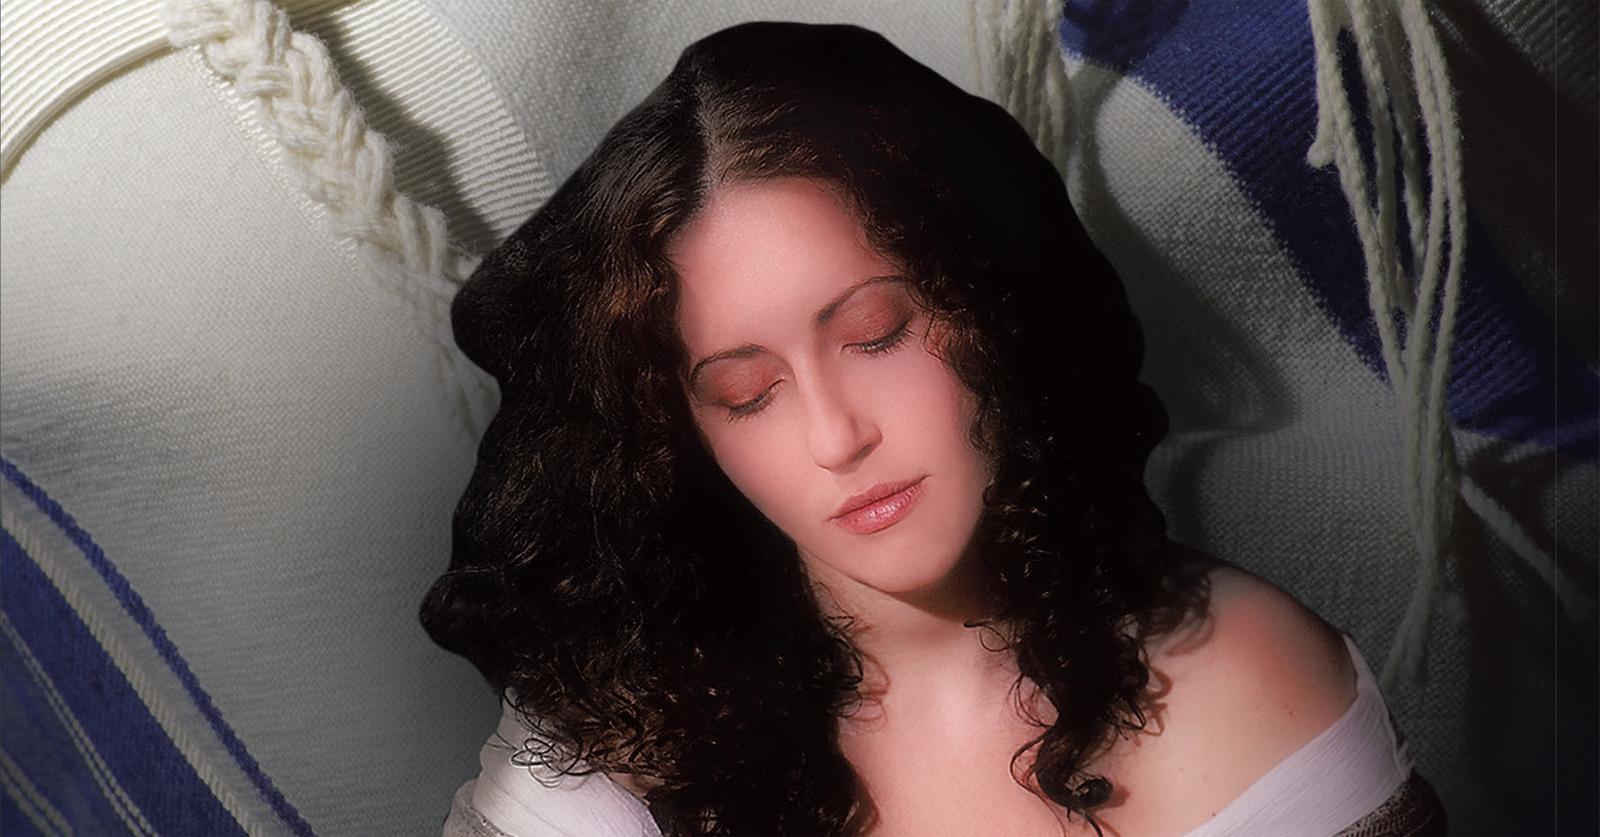 Author of Naomi, the Rabbi's Wife